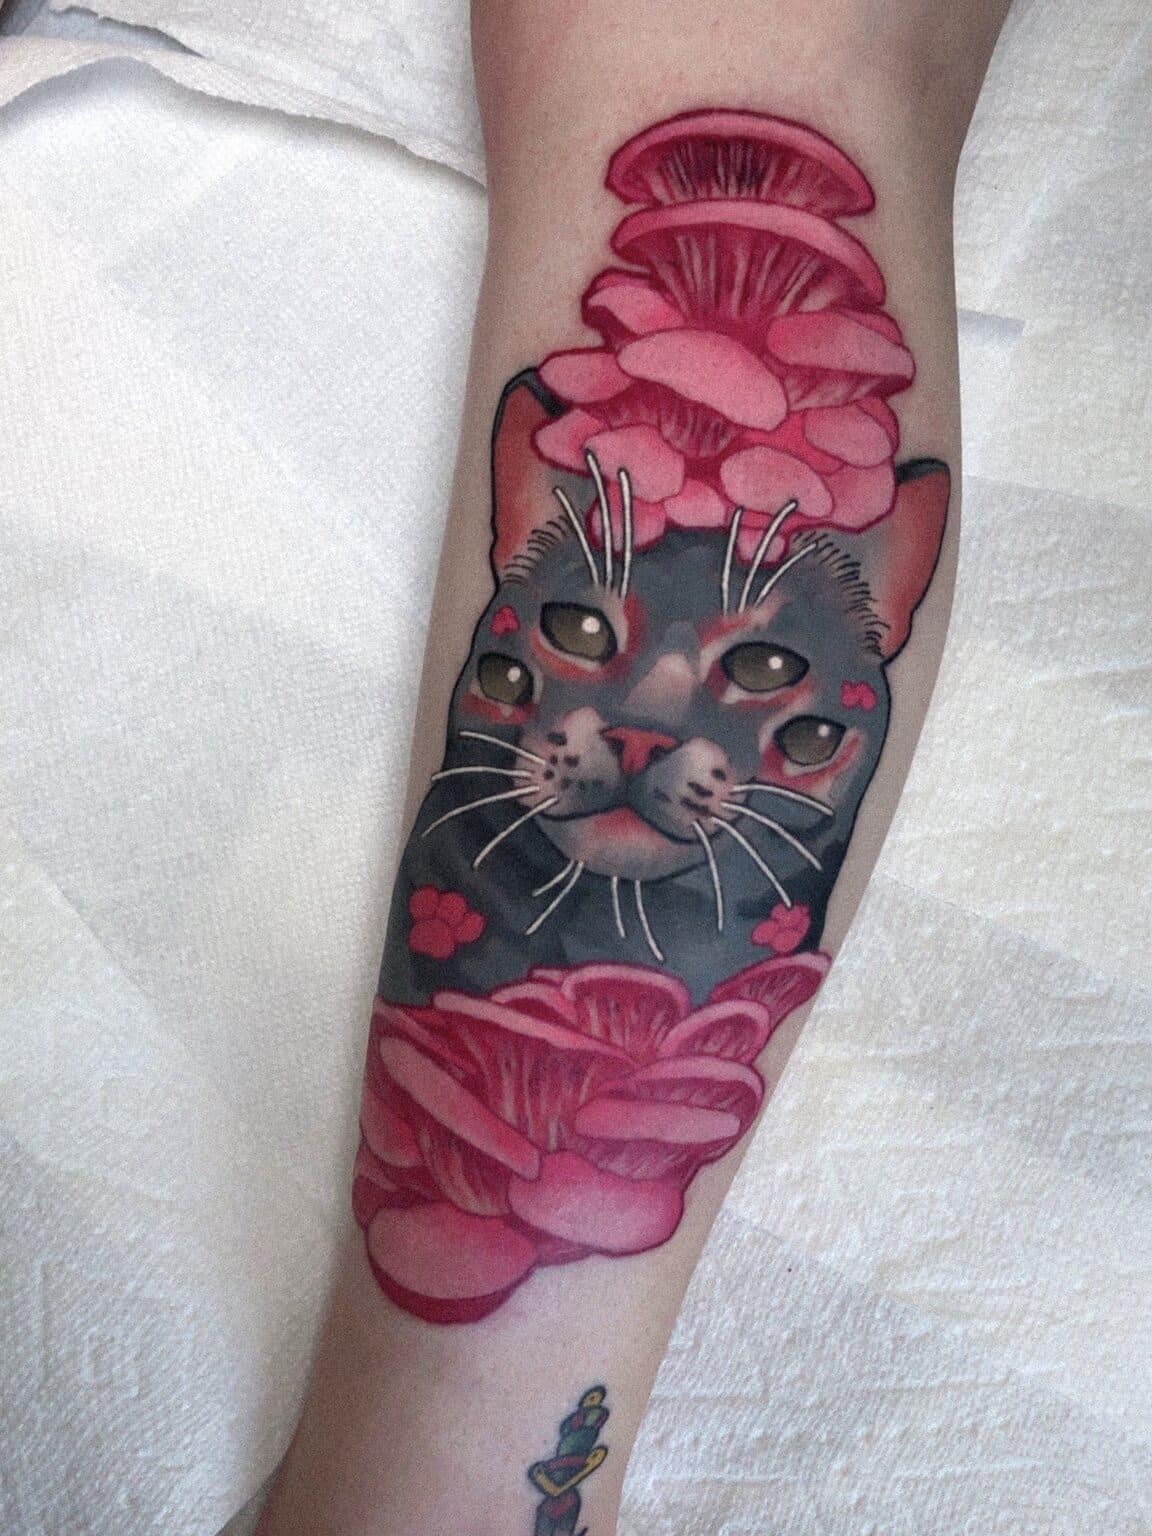 igor-puente-tattoo-artist-cat-4-eyes